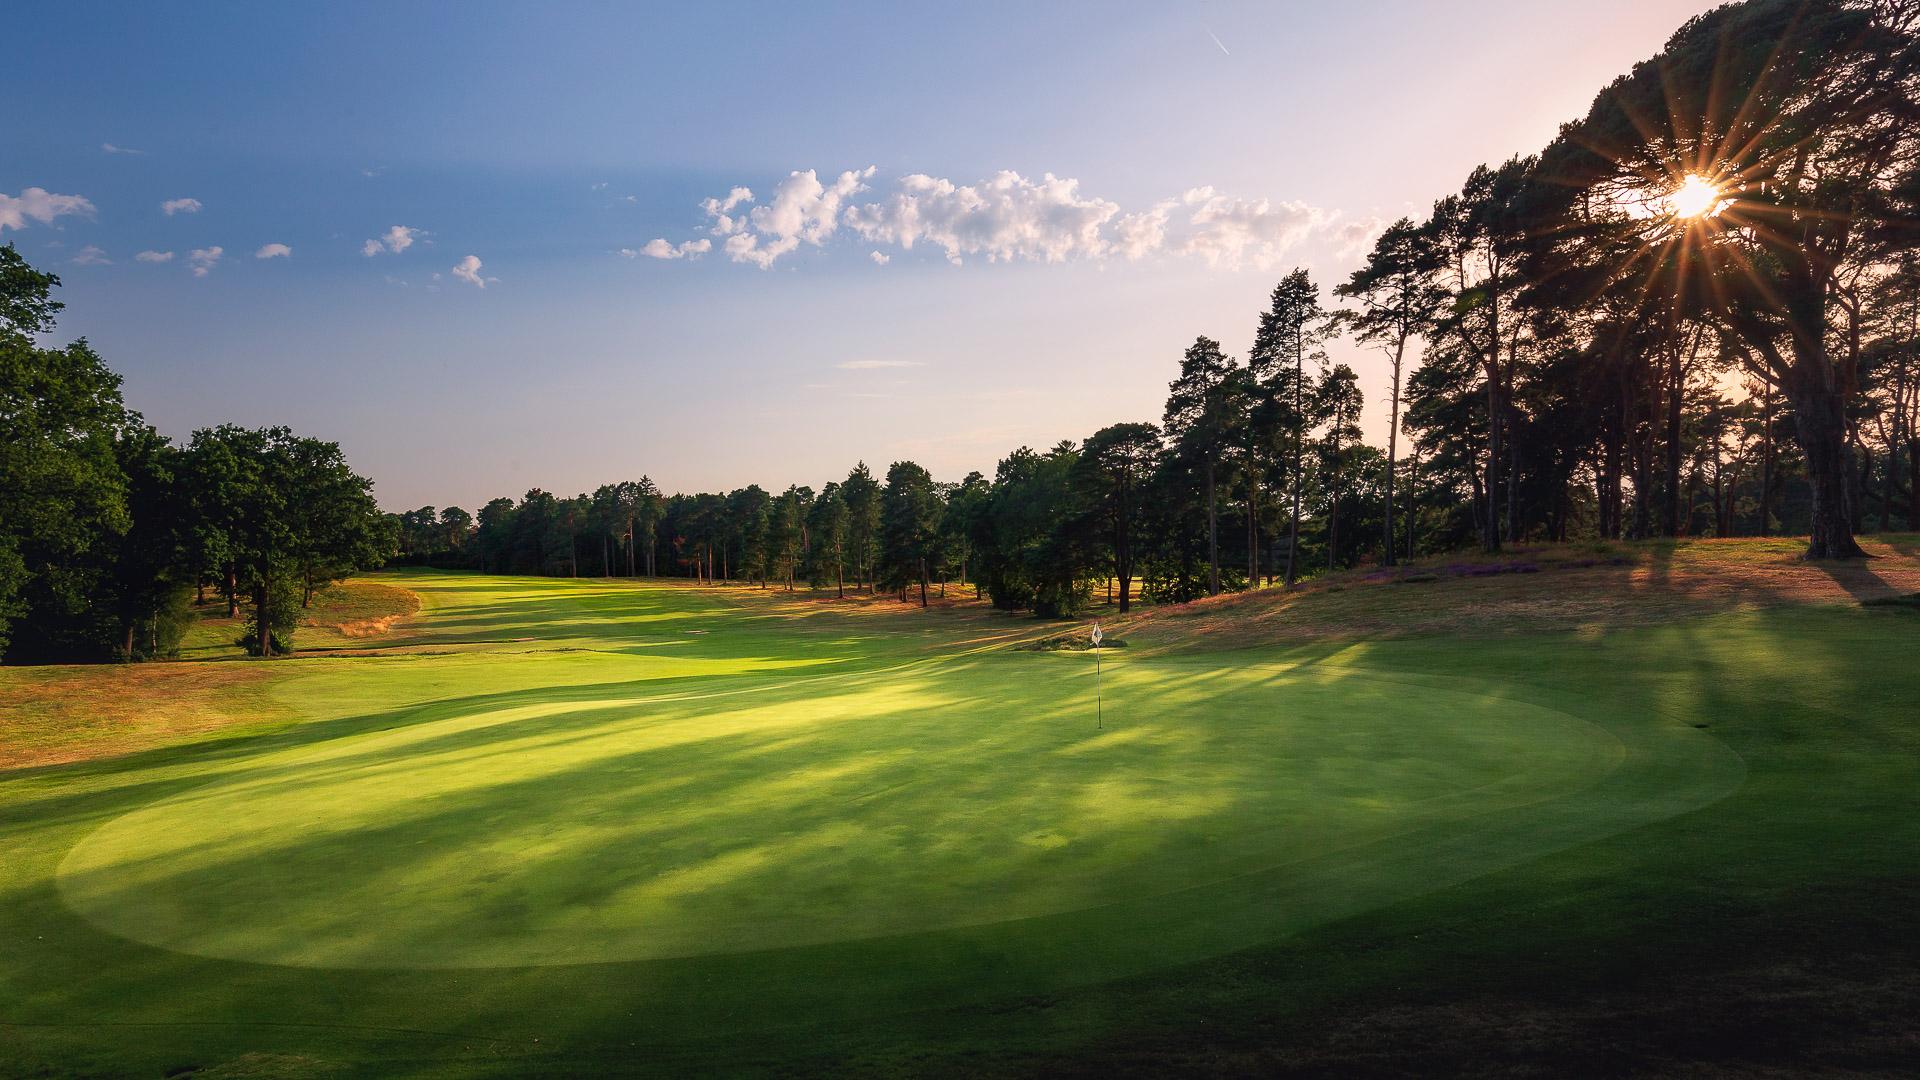 02nd-Hole-St-Georges-Hill-Golf-Club-2115-Edit